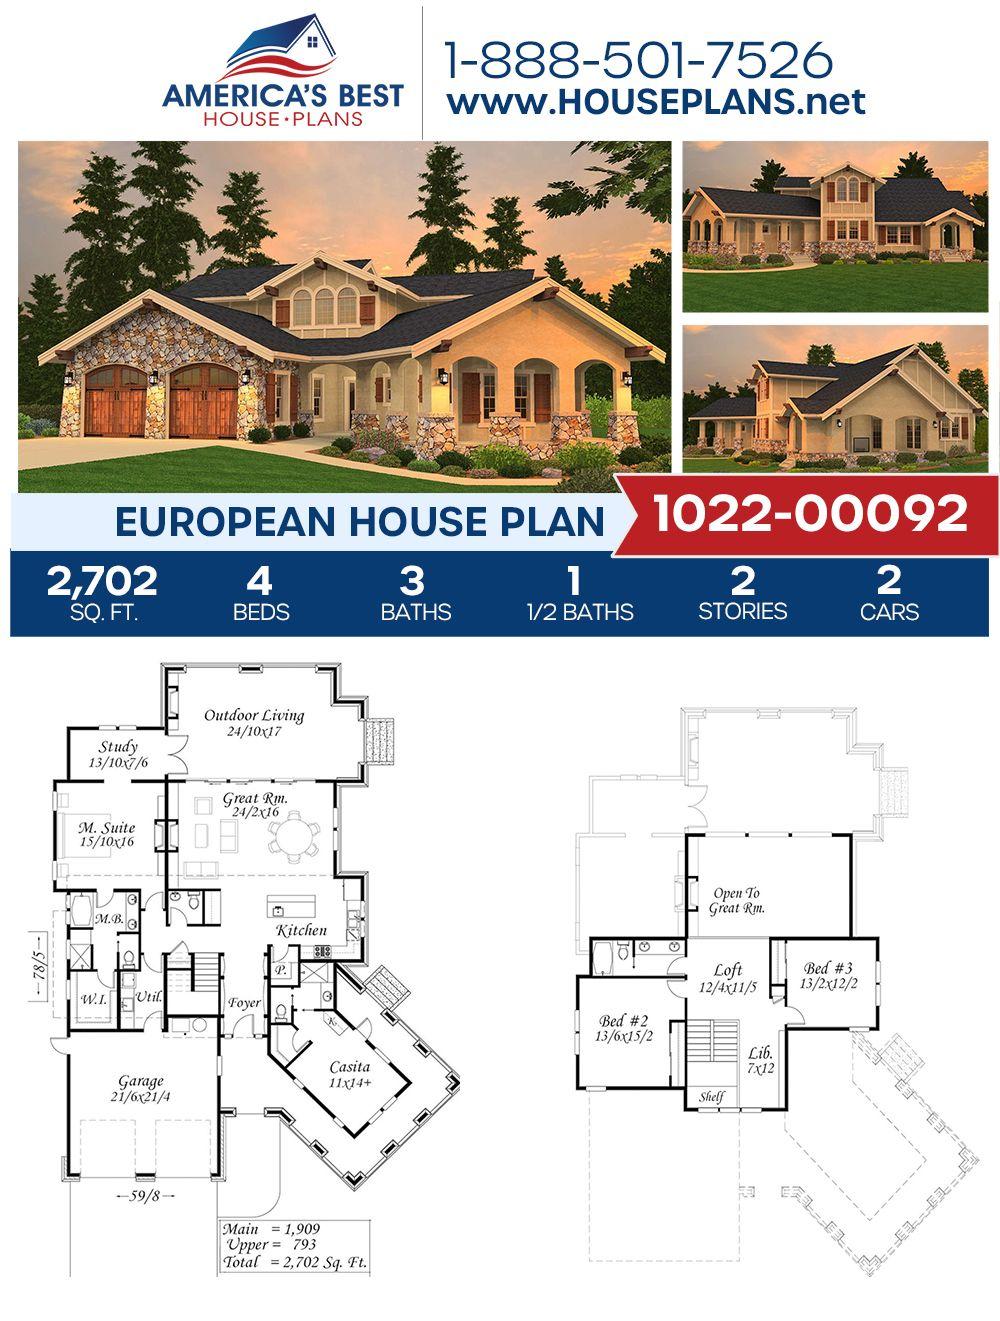 House Plan Square Feet In 2020 European House Plans Dream House Plans European House